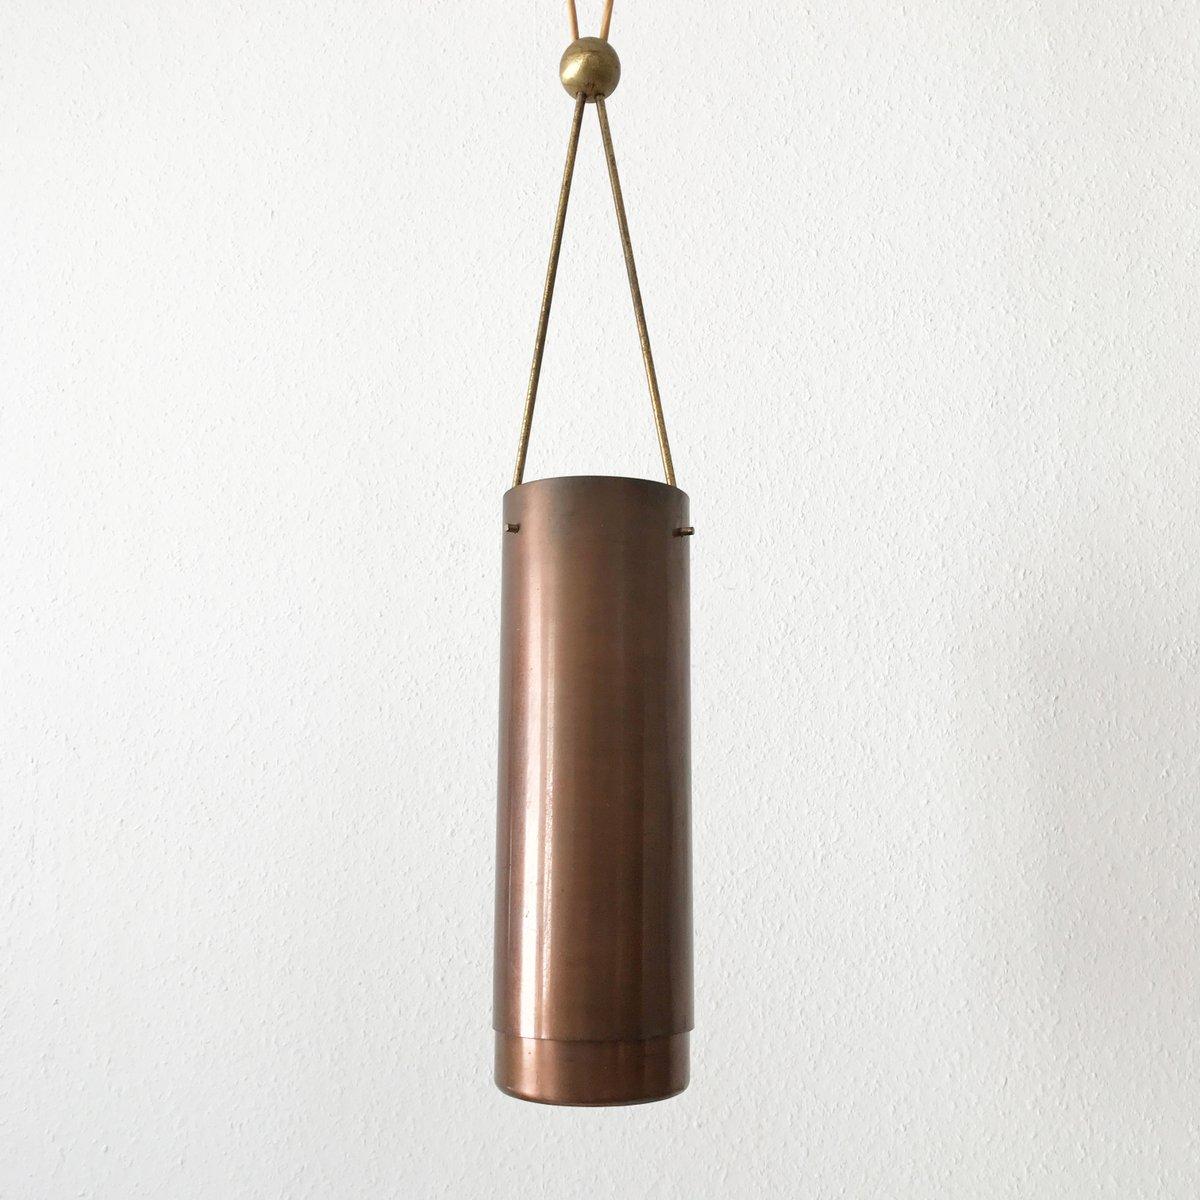 zylindrische mid century modern h ngelampe 1950er bei. Black Bedroom Furniture Sets. Home Design Ideas